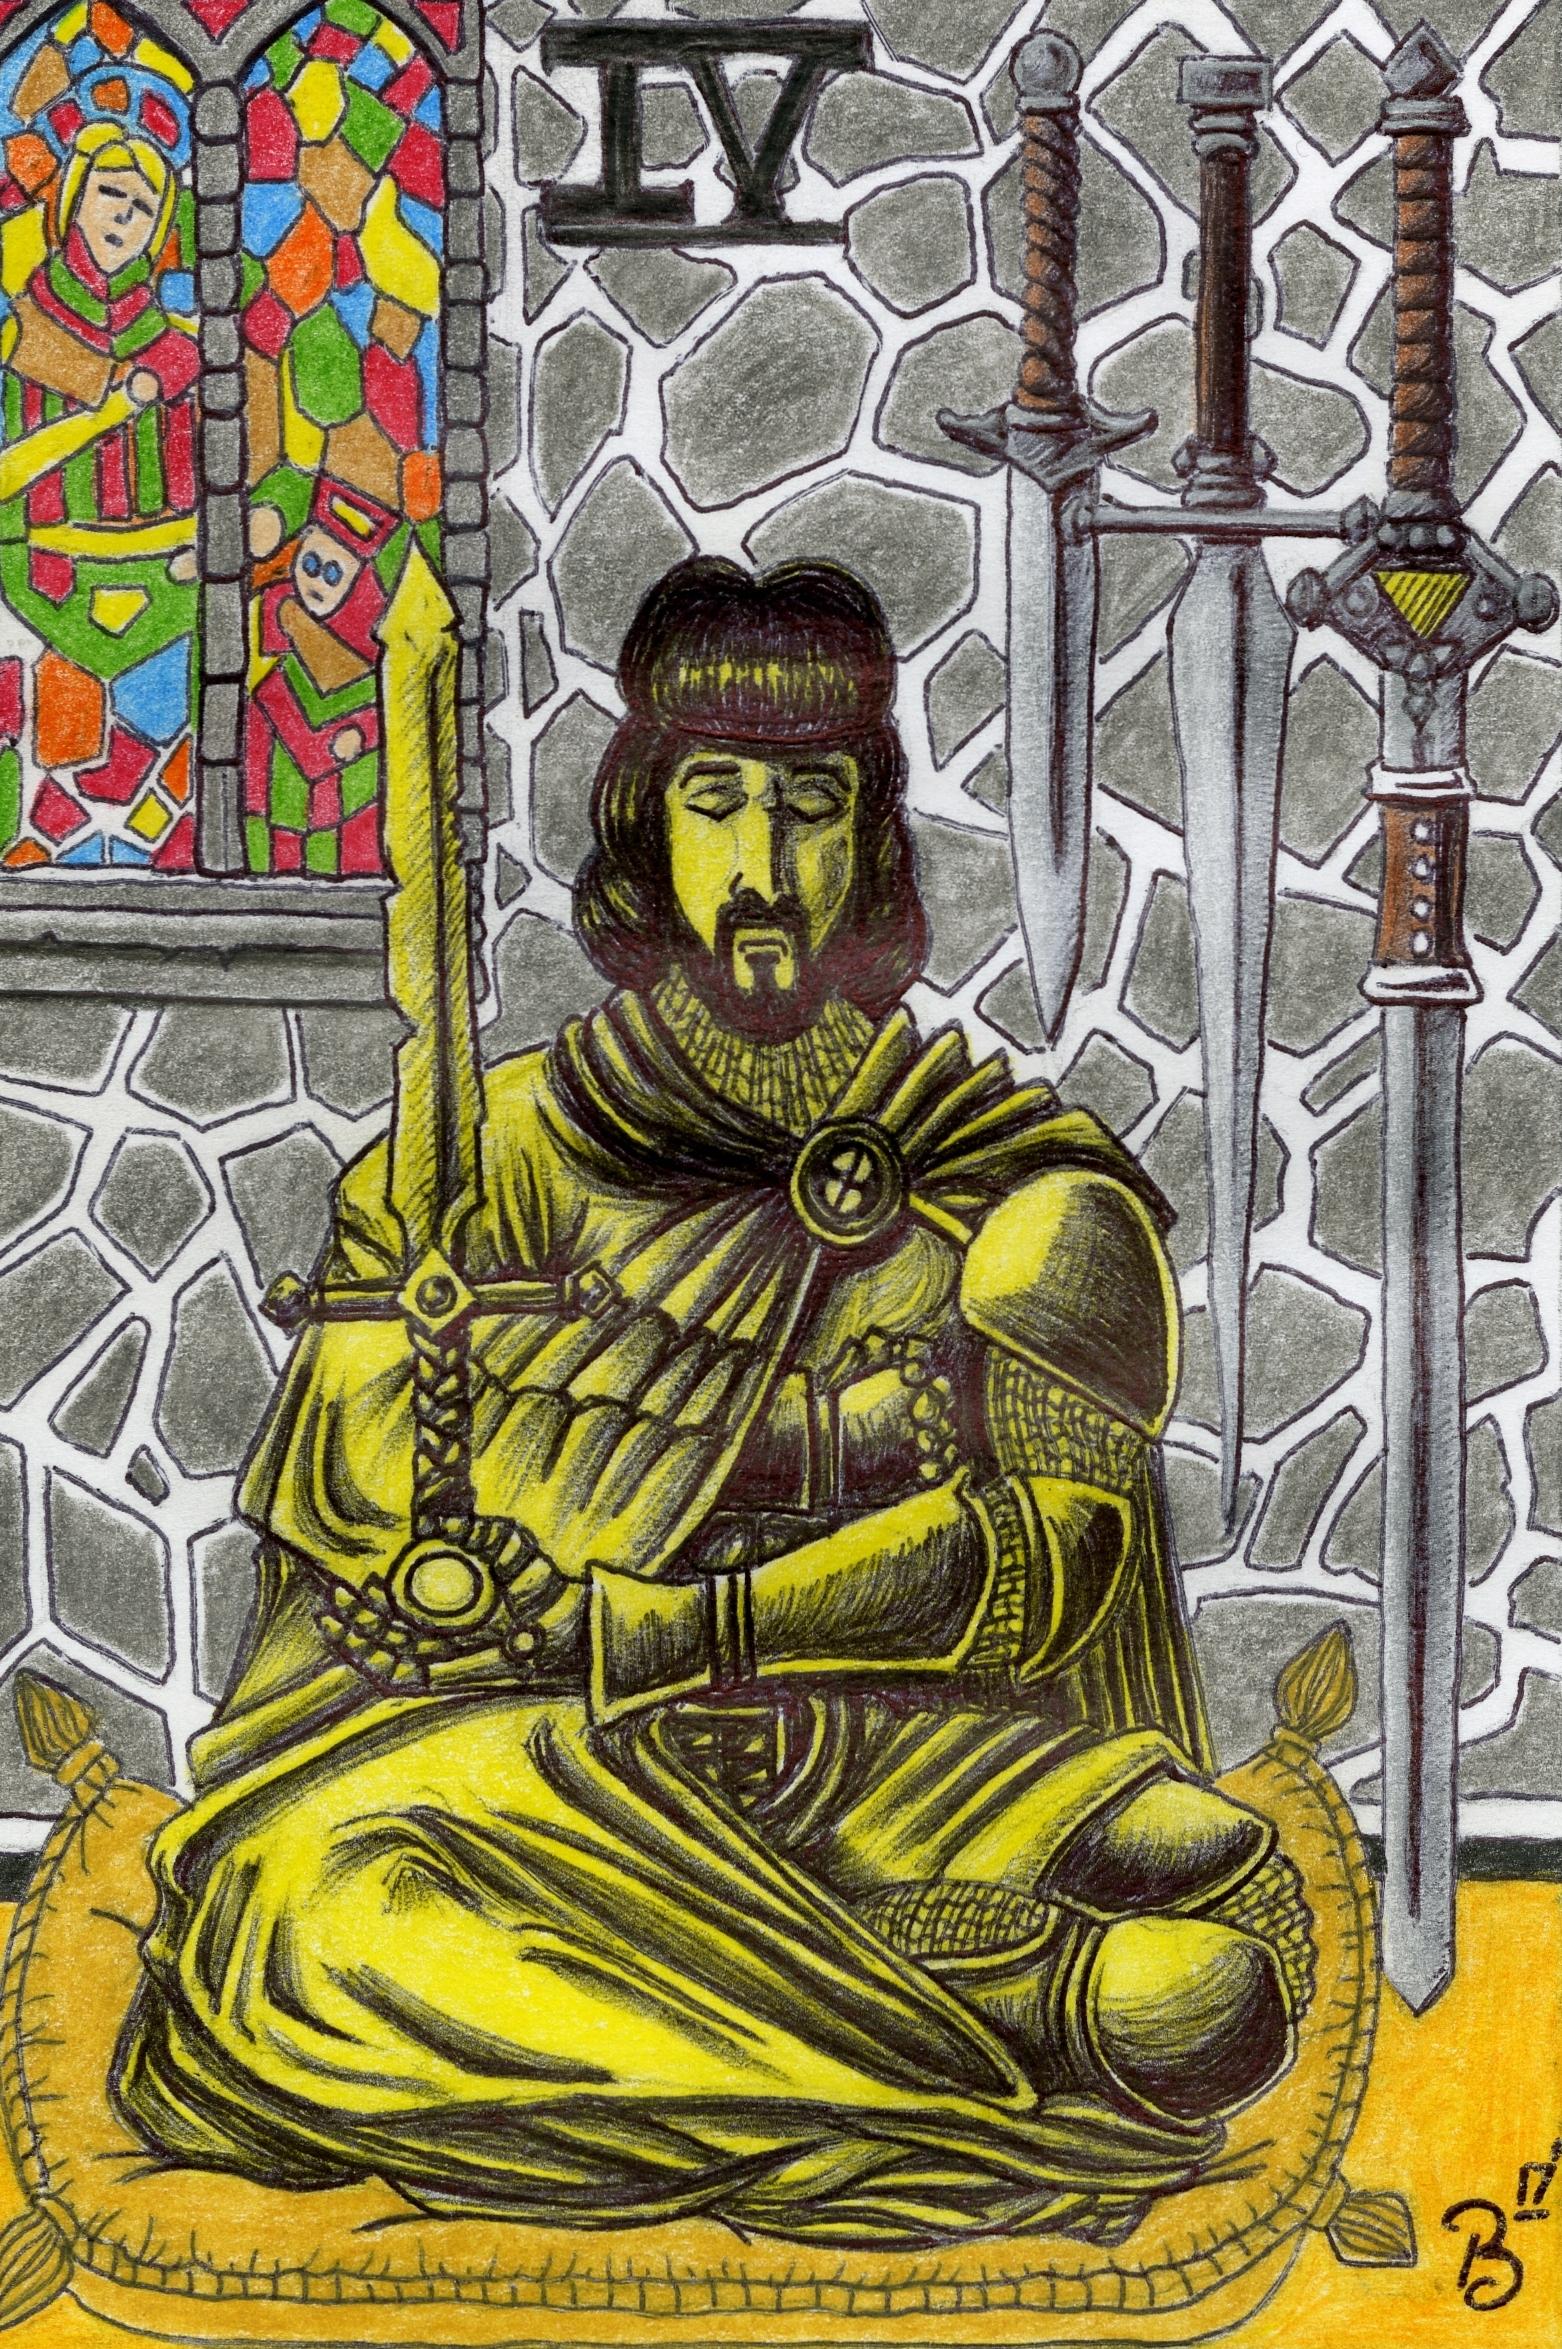 Bryan Smith - Four of Swords